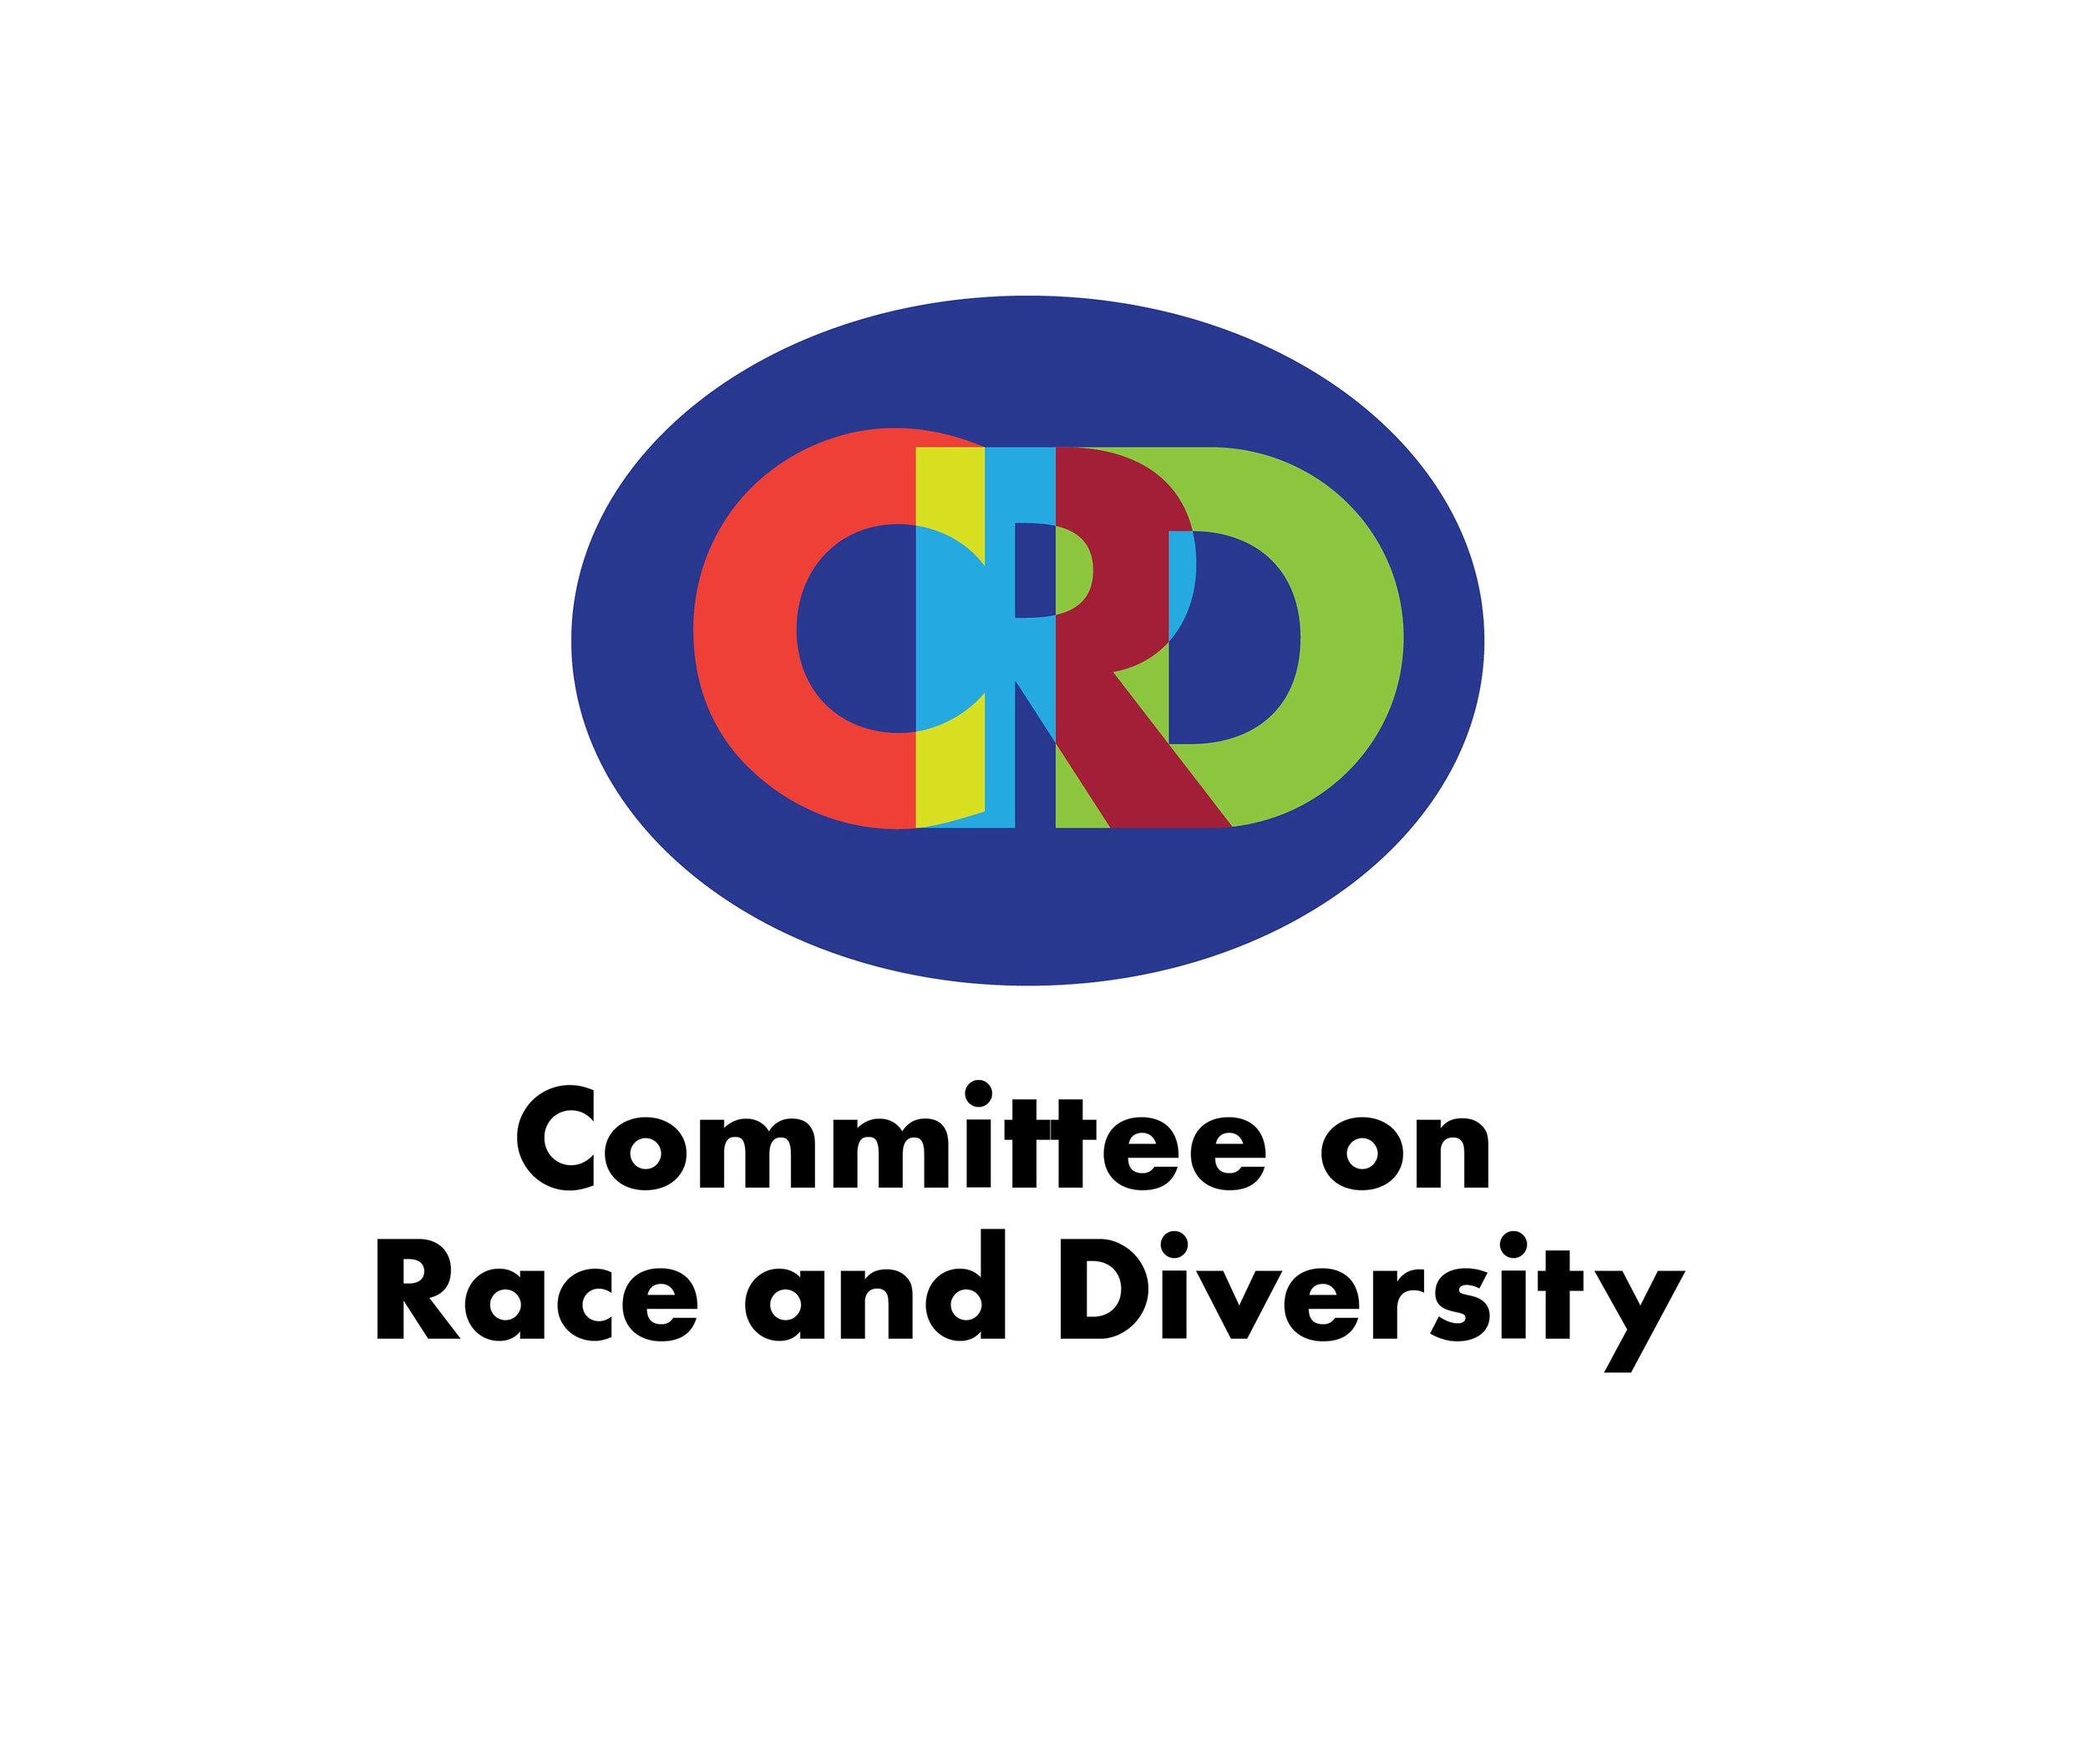 MIT_CRD-logo-1ful1crp1lrgmed.jpg